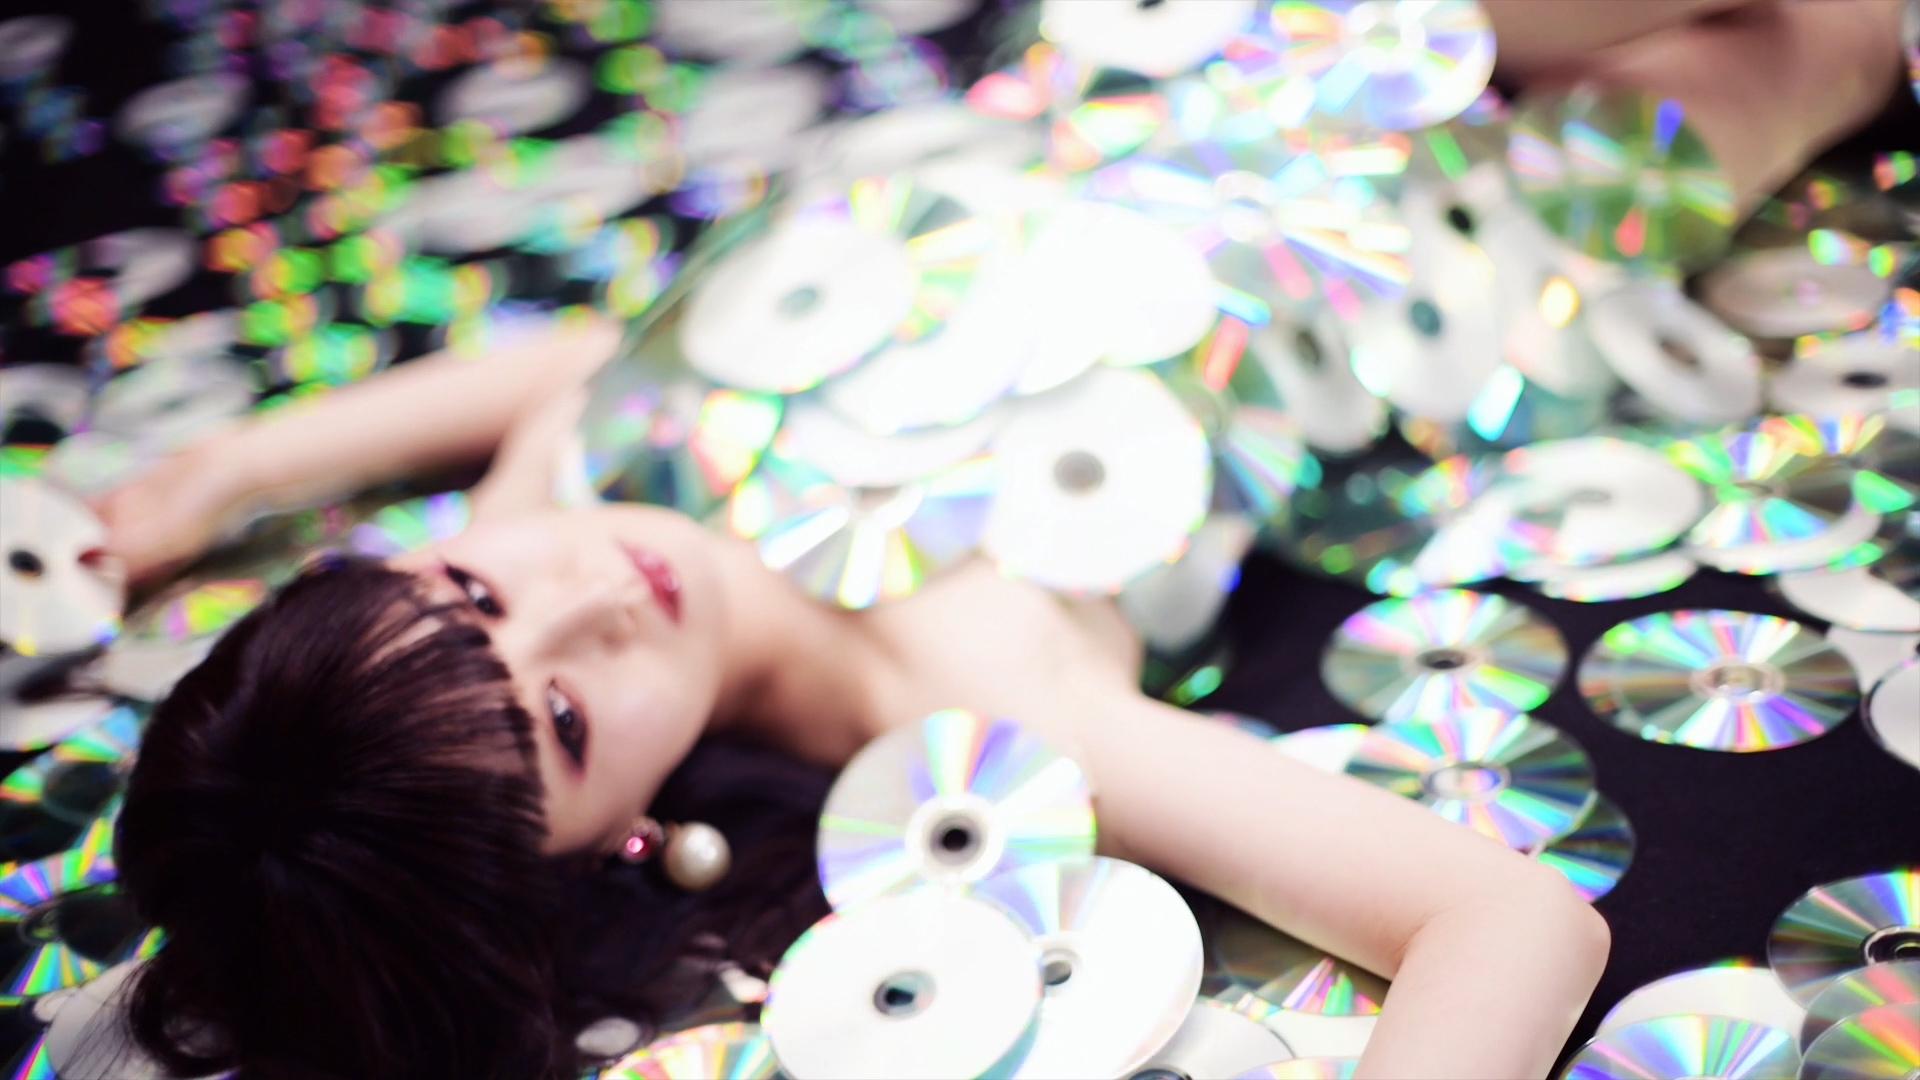 RMMS-URBANGARDE-Atashi-Fiction-MV-3